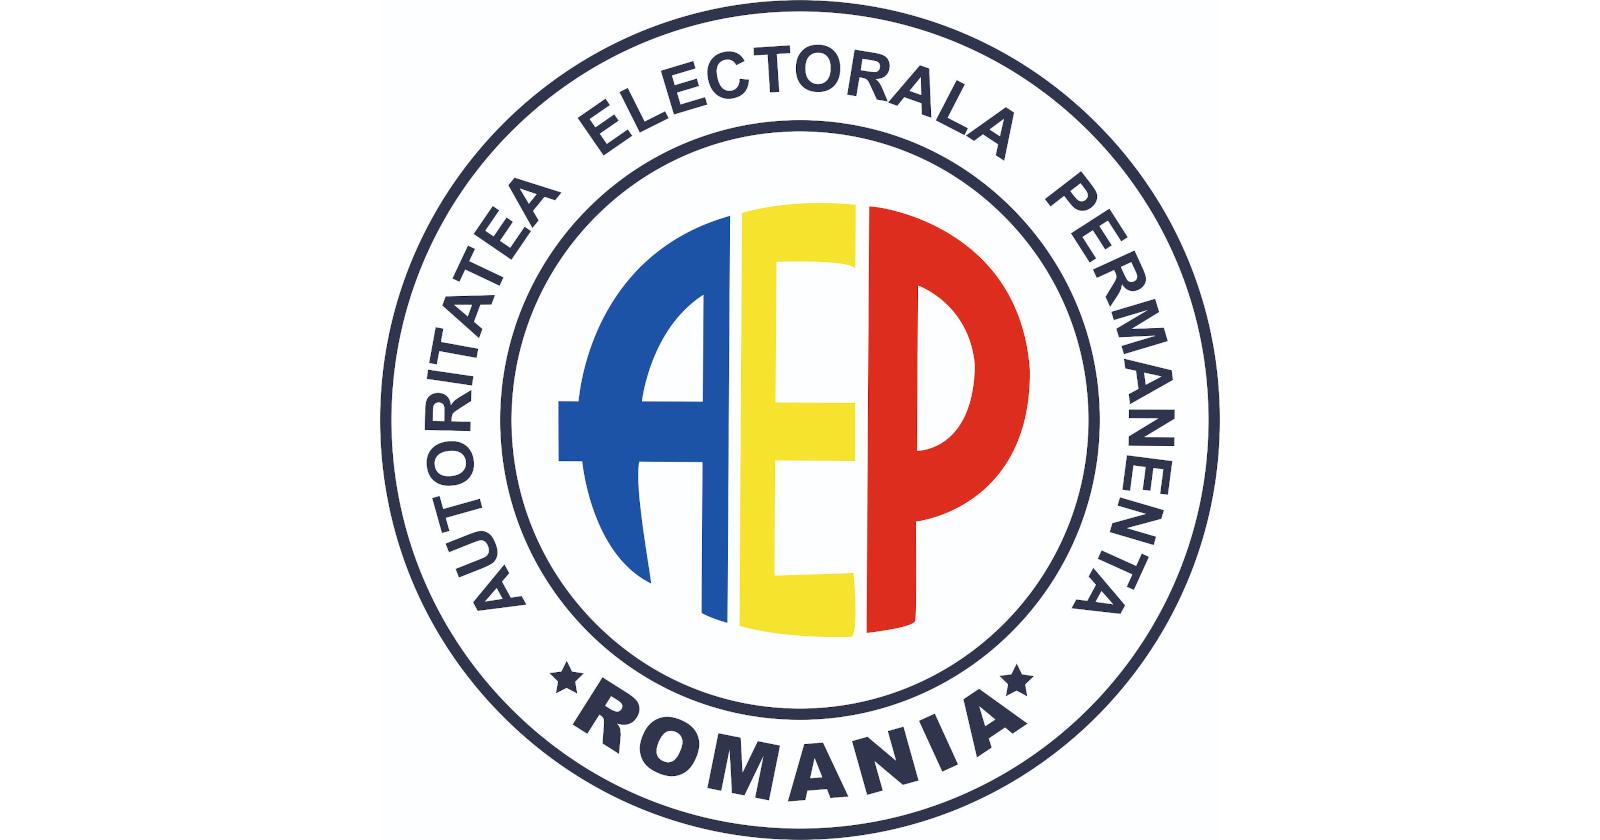 https://ziarul.romania-rationala.ro/control/articole/articole/autoritatea-electorala-permanenta_2.jpg